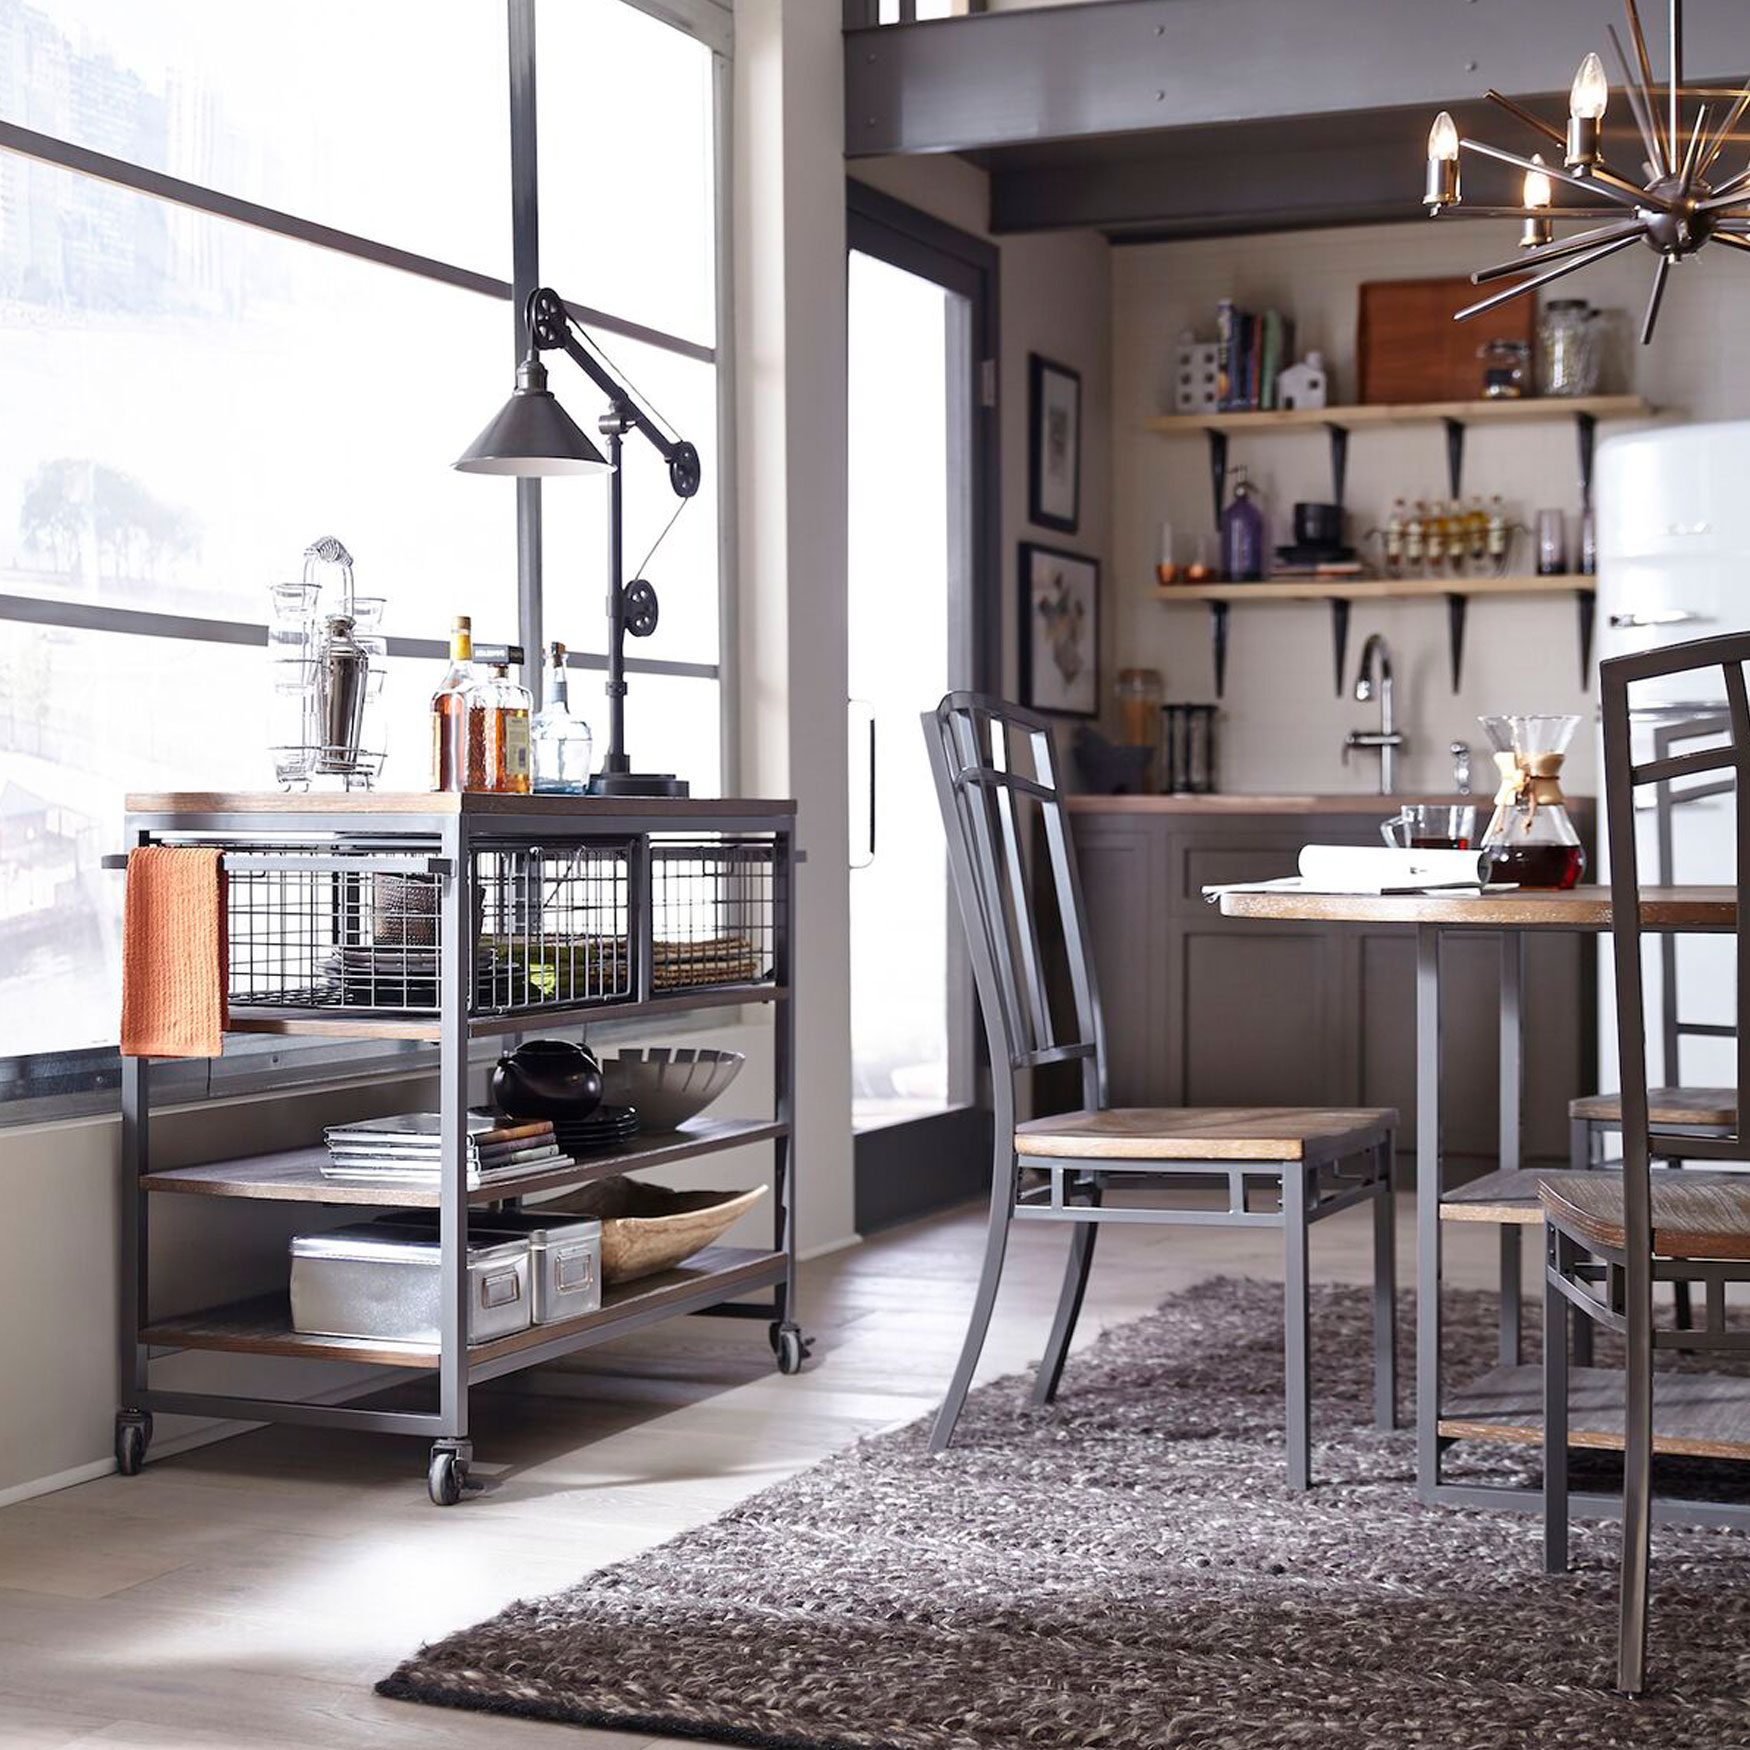 Brylane Home Kitchen: Barnside Metro Kitchen Cart